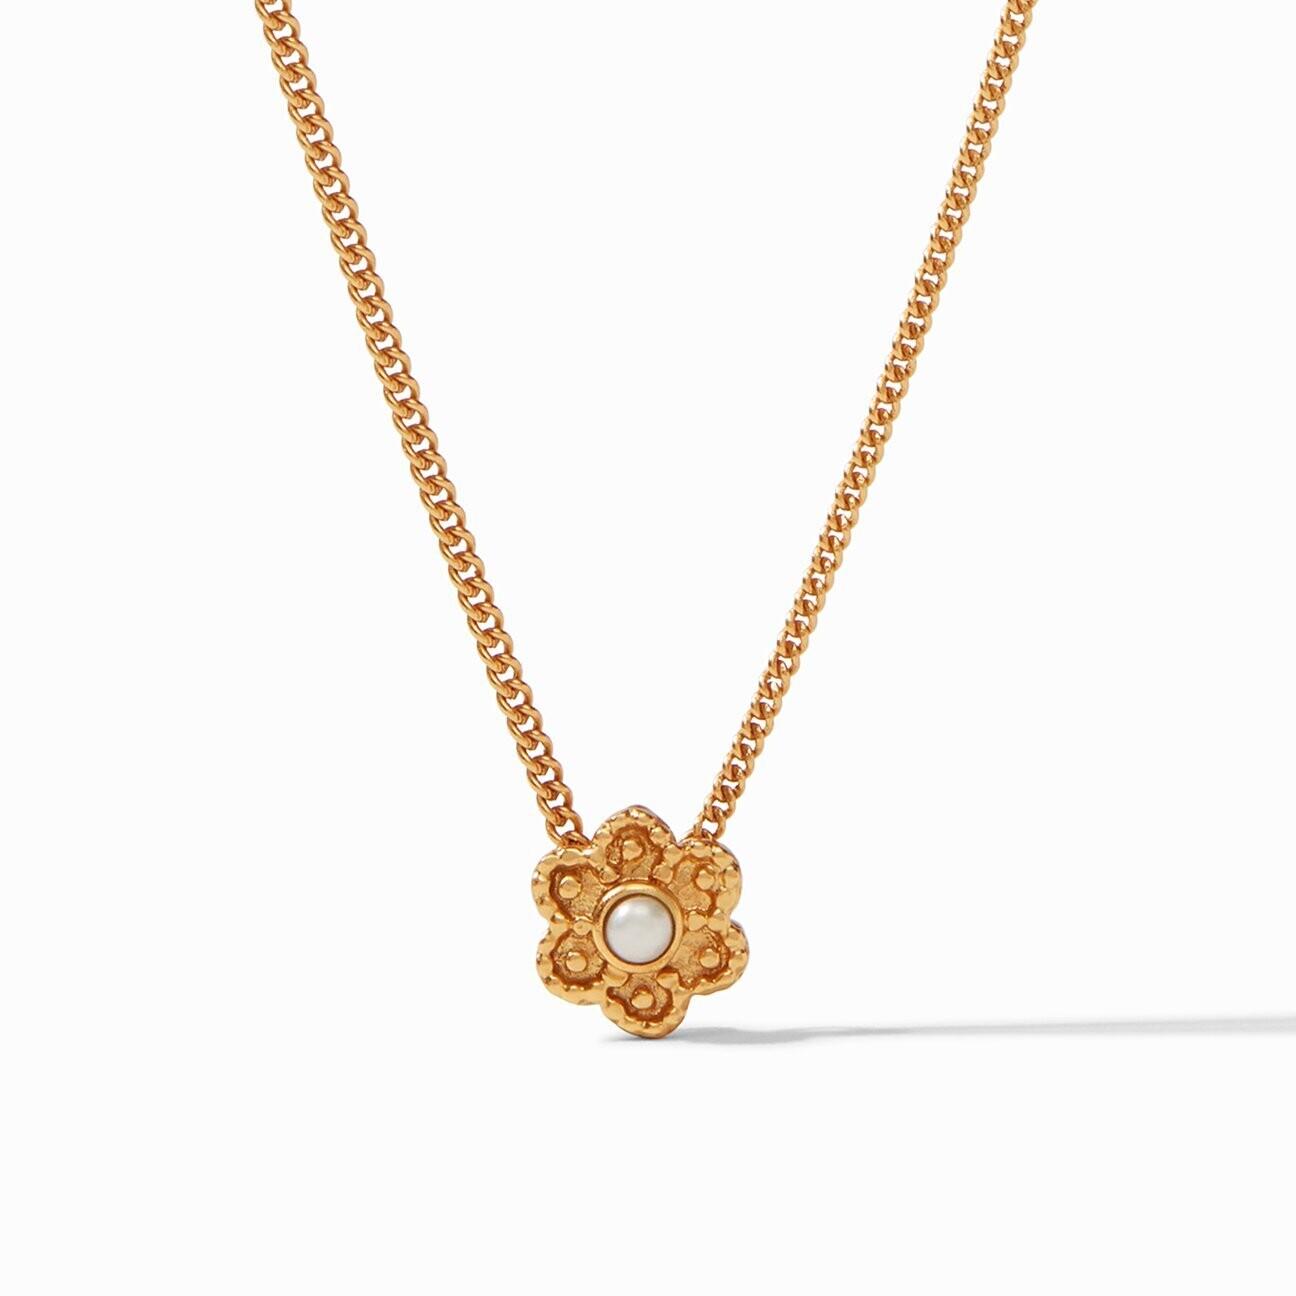 JULIE VOS Colette Delicate Necklace